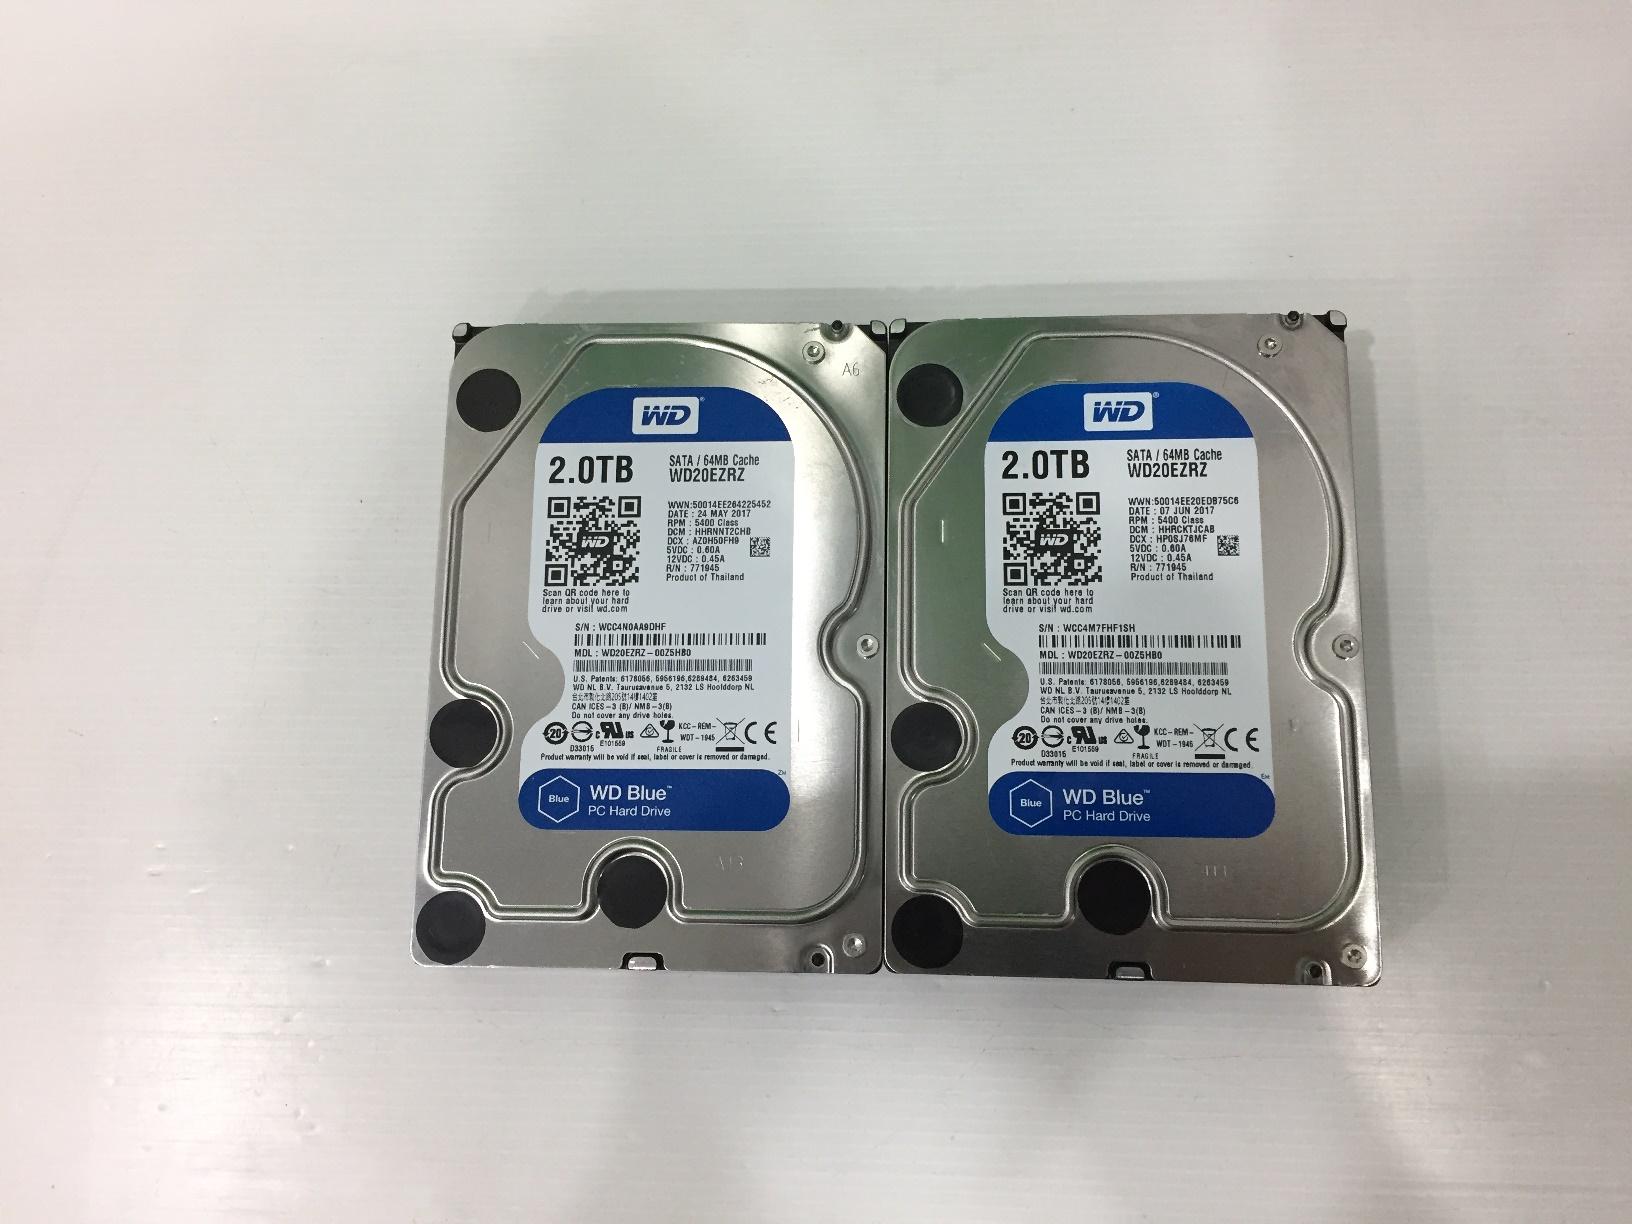 2.0 TB HDD WD SATA-3 BLUE (WD20EZRZ)